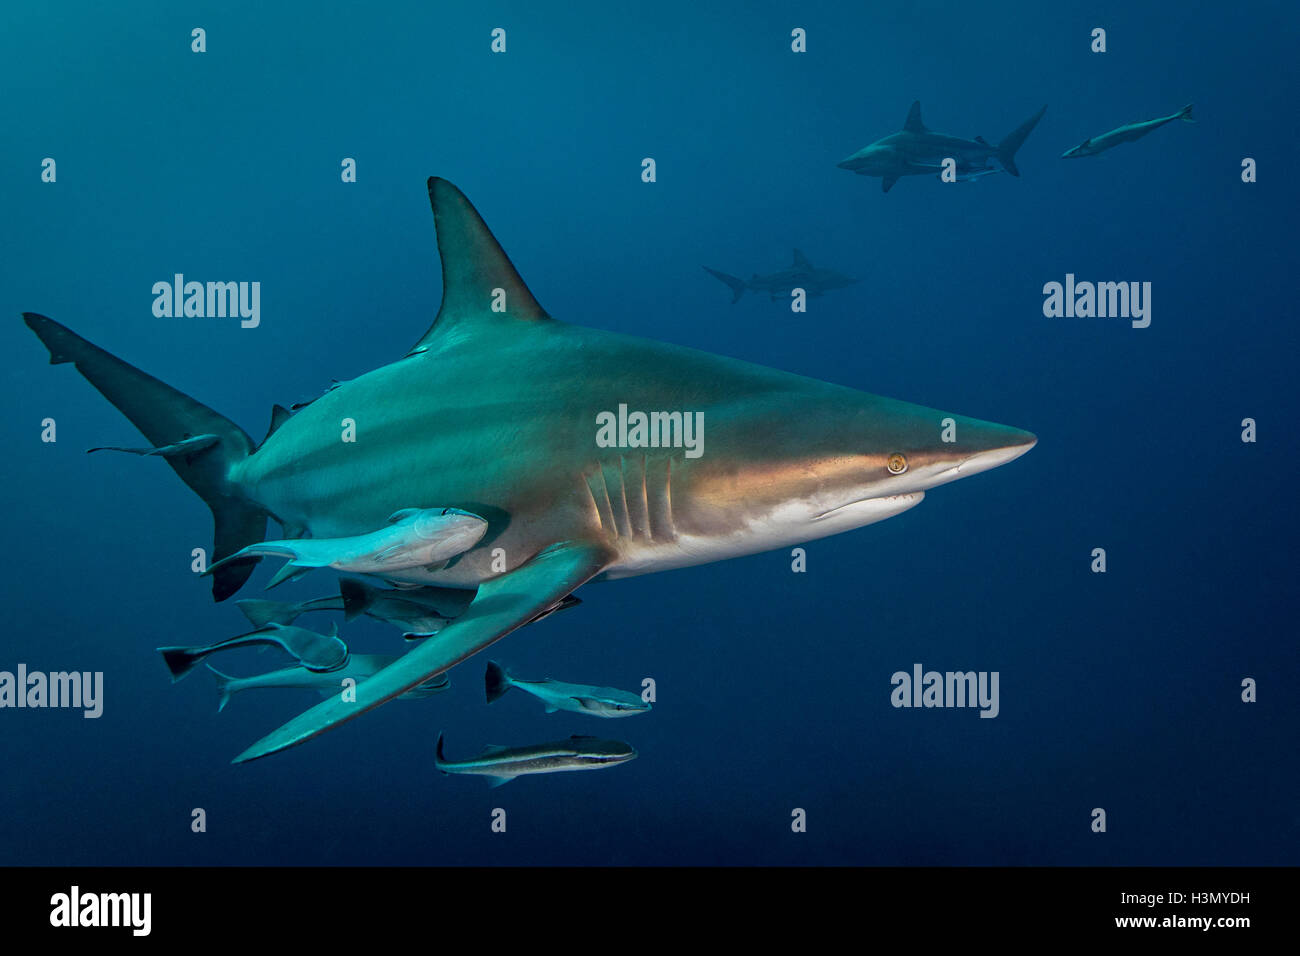 Oceanic Blacktip Shark (Carcharhinus Limbatus) circling prey, Aliwal Shoal, South Africa Stock Photo